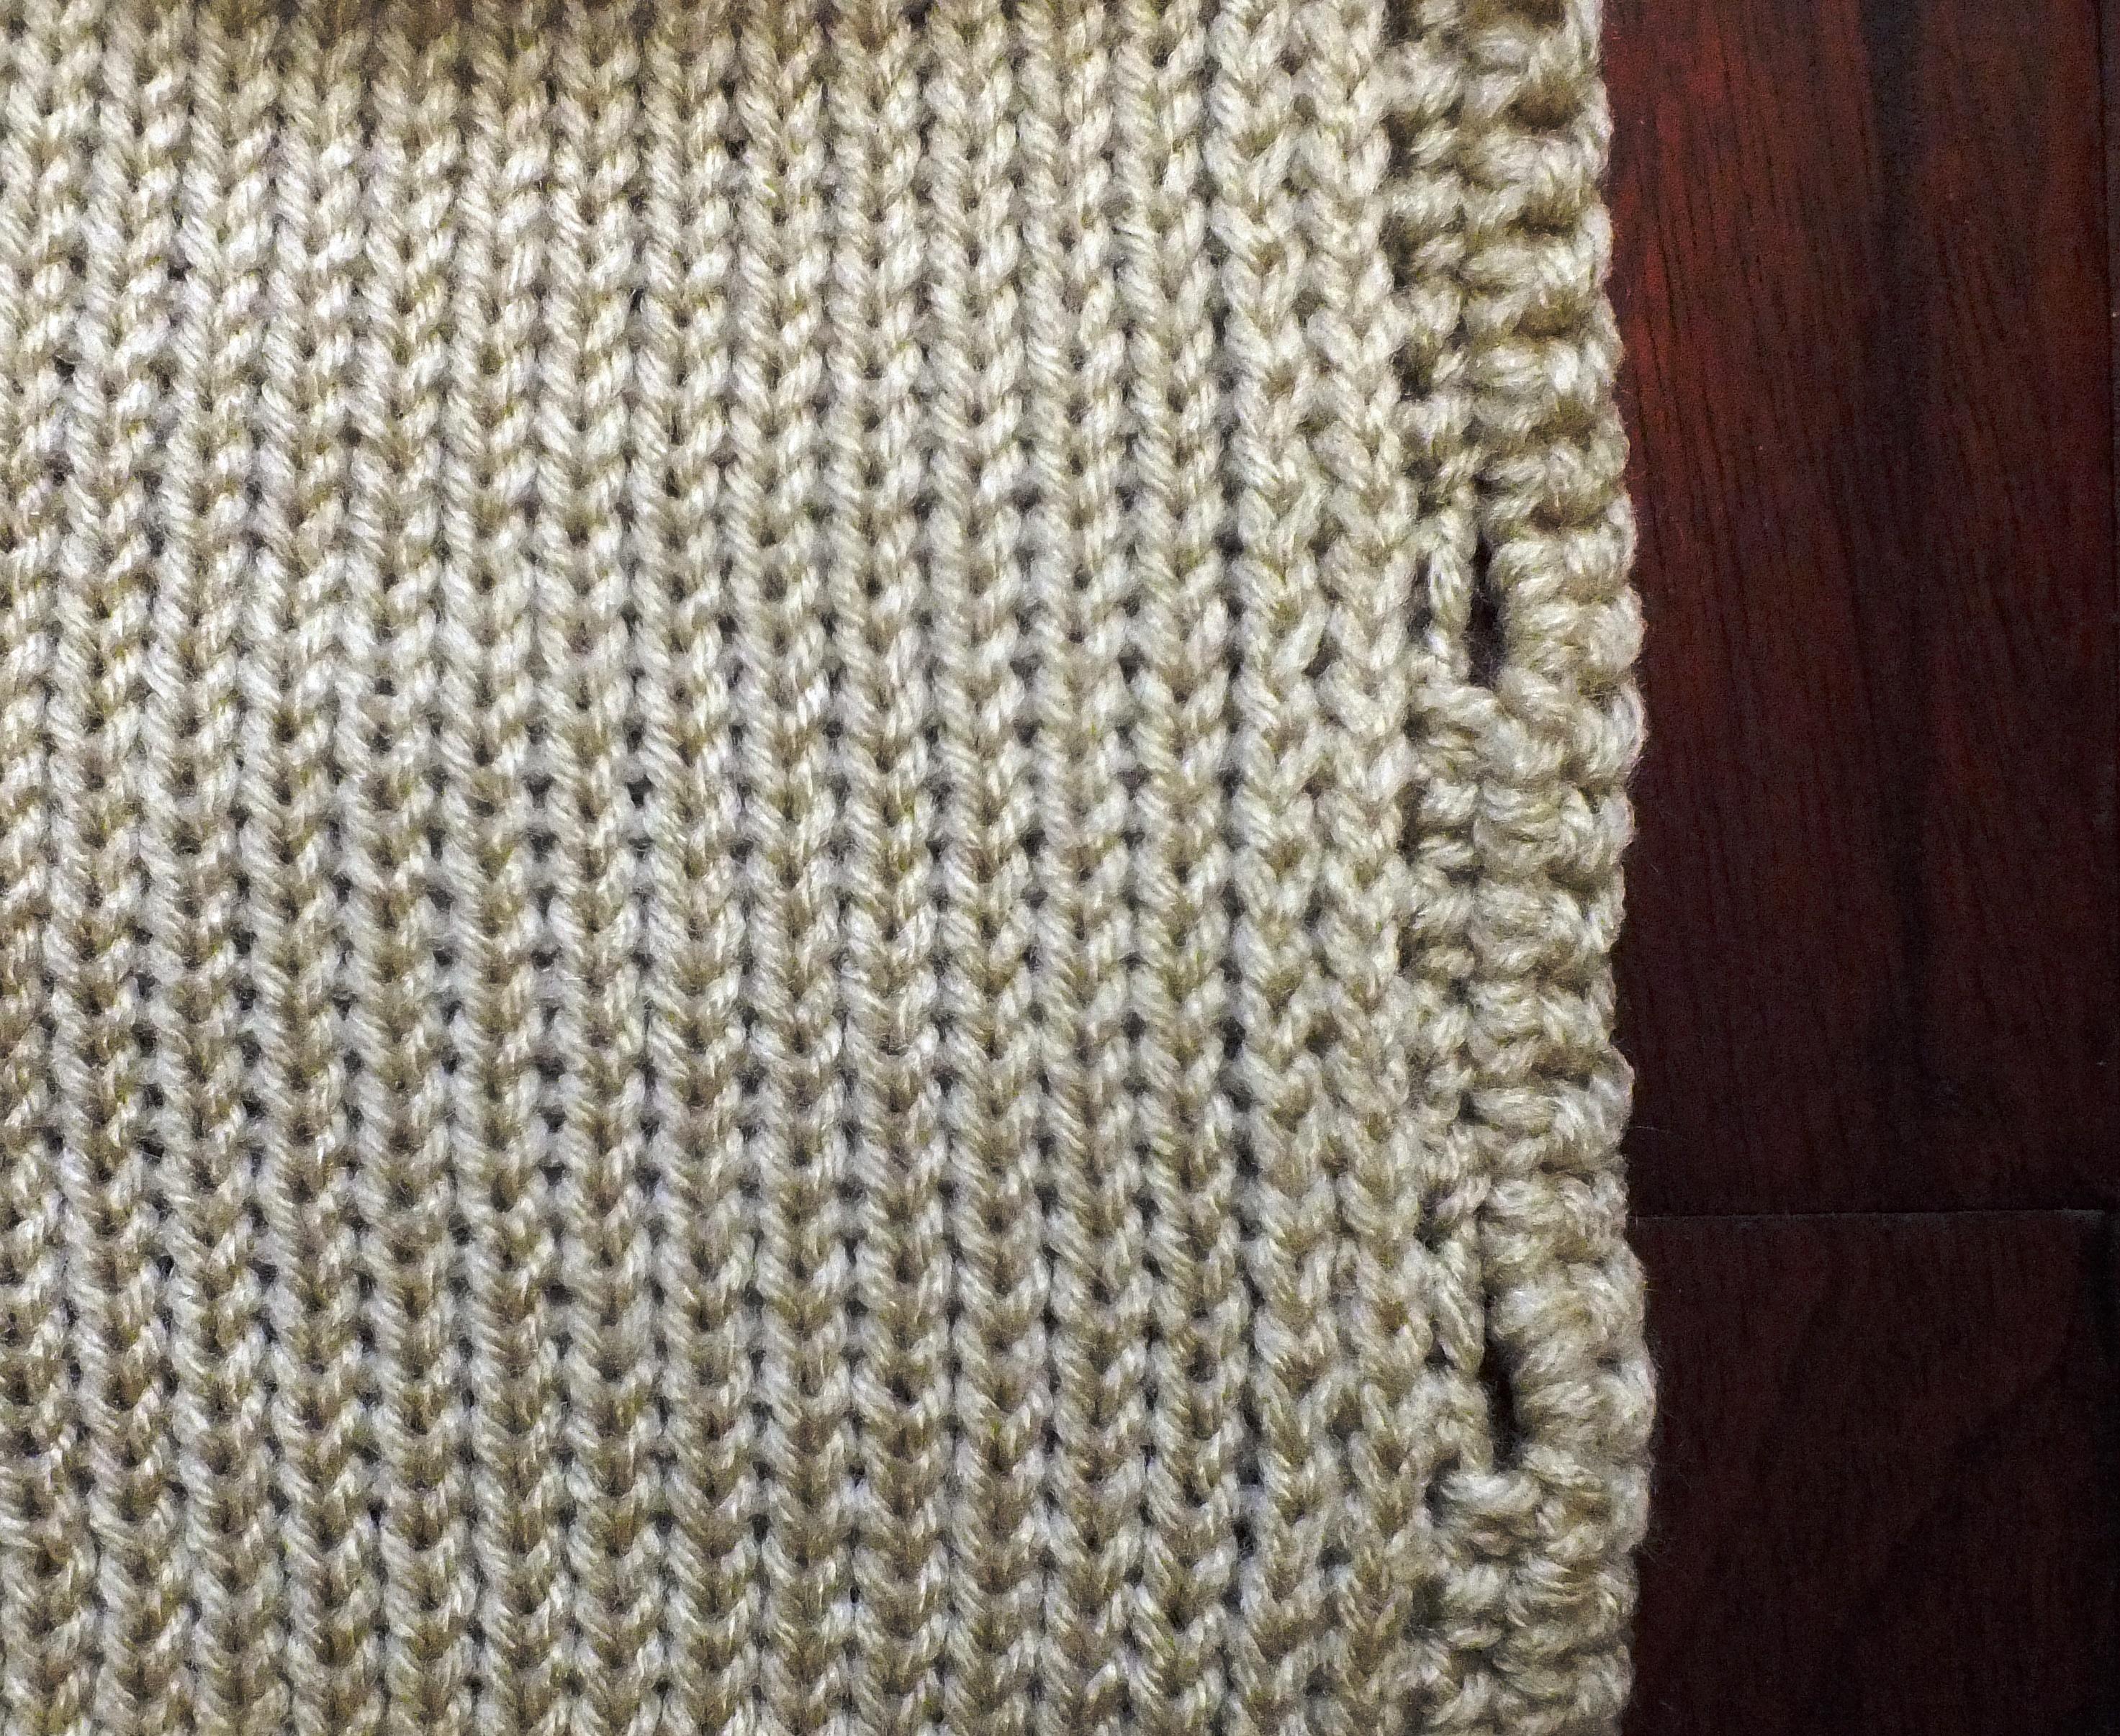 Non Roll Edge for Machine Knitting | Cckittenknits\'s Weblog